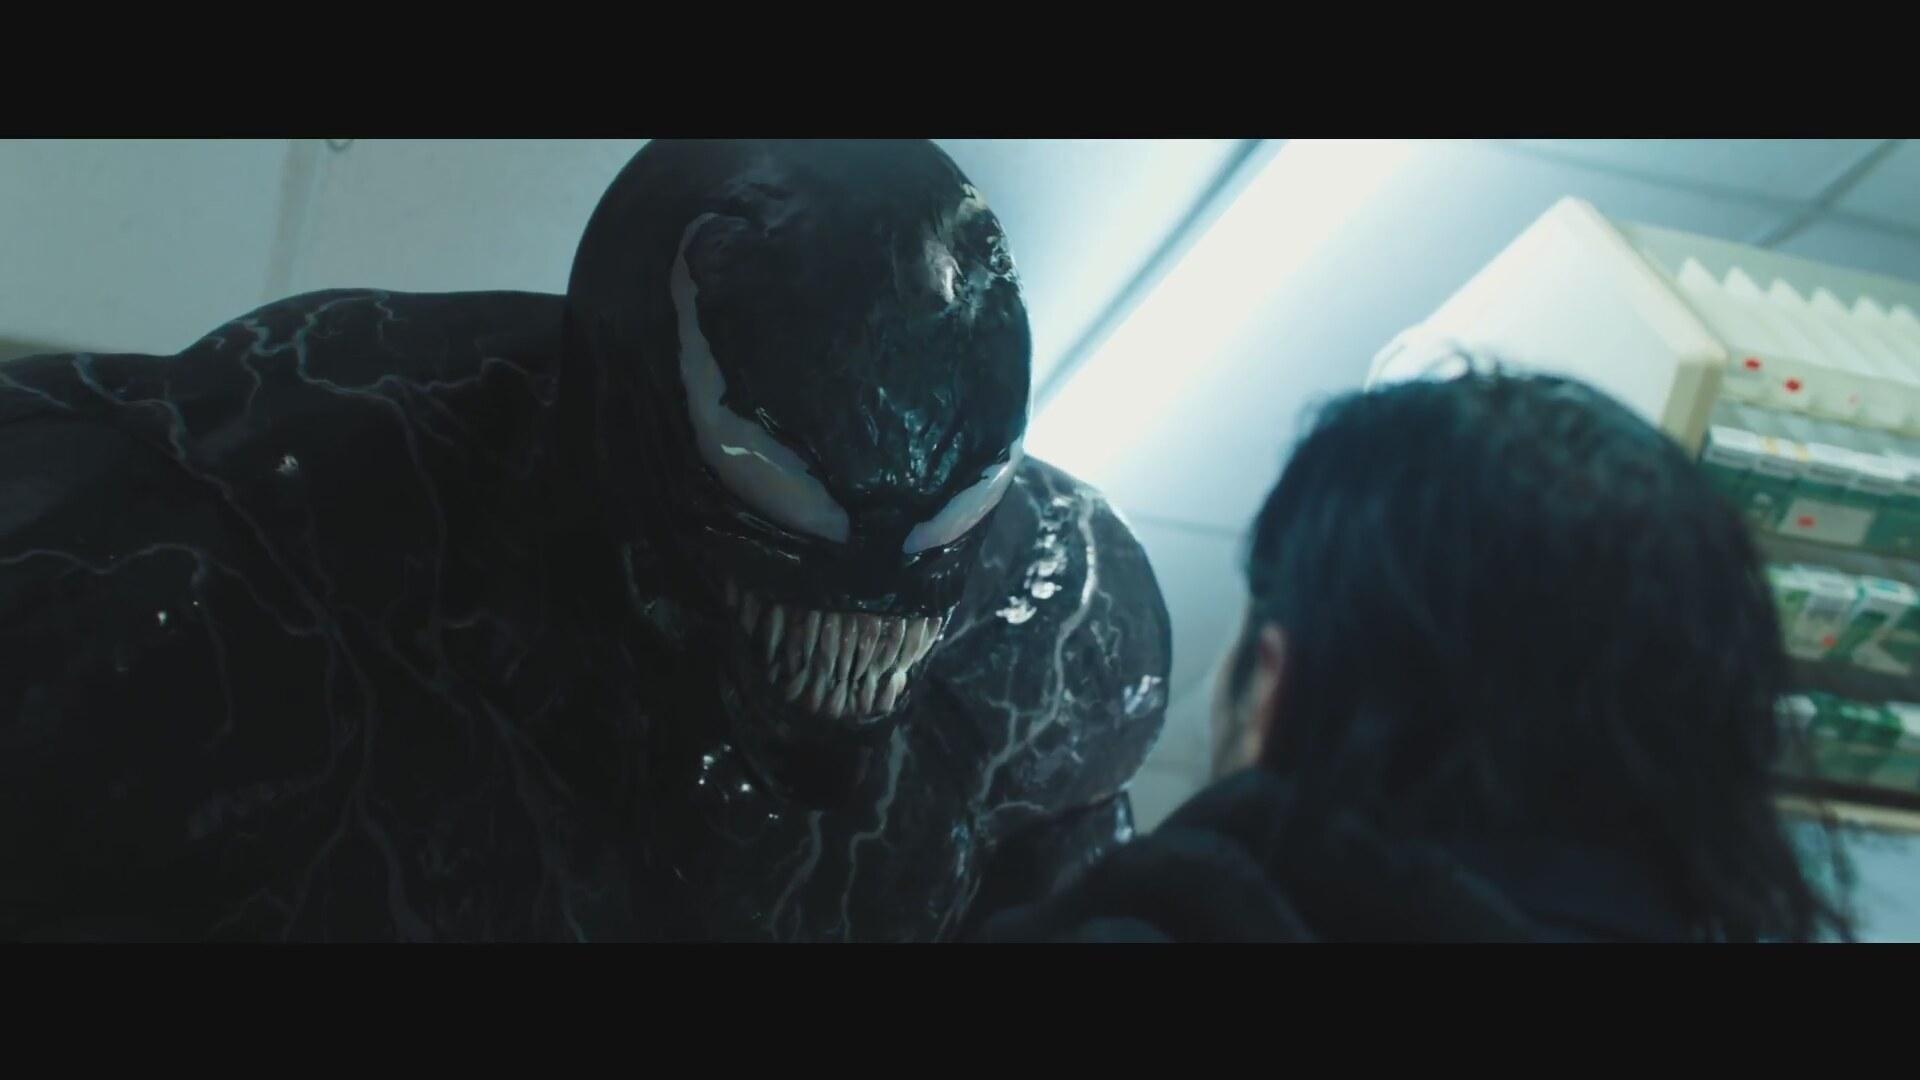 venom download full movie hd